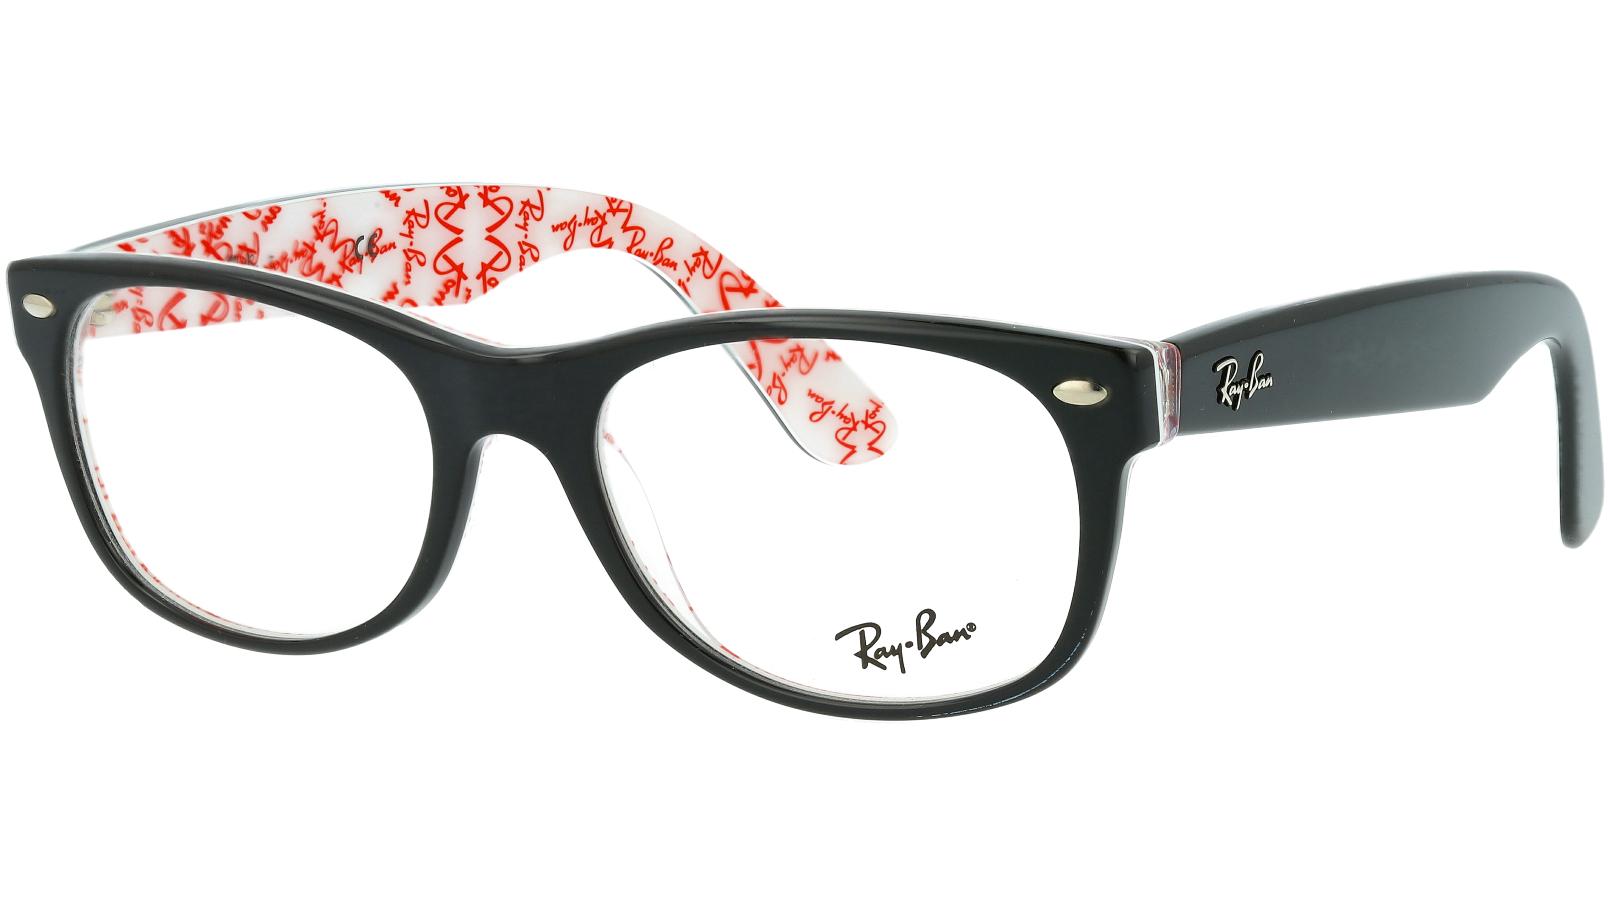 Ray-Ban RB5184 5104 52 BLACK Glasses